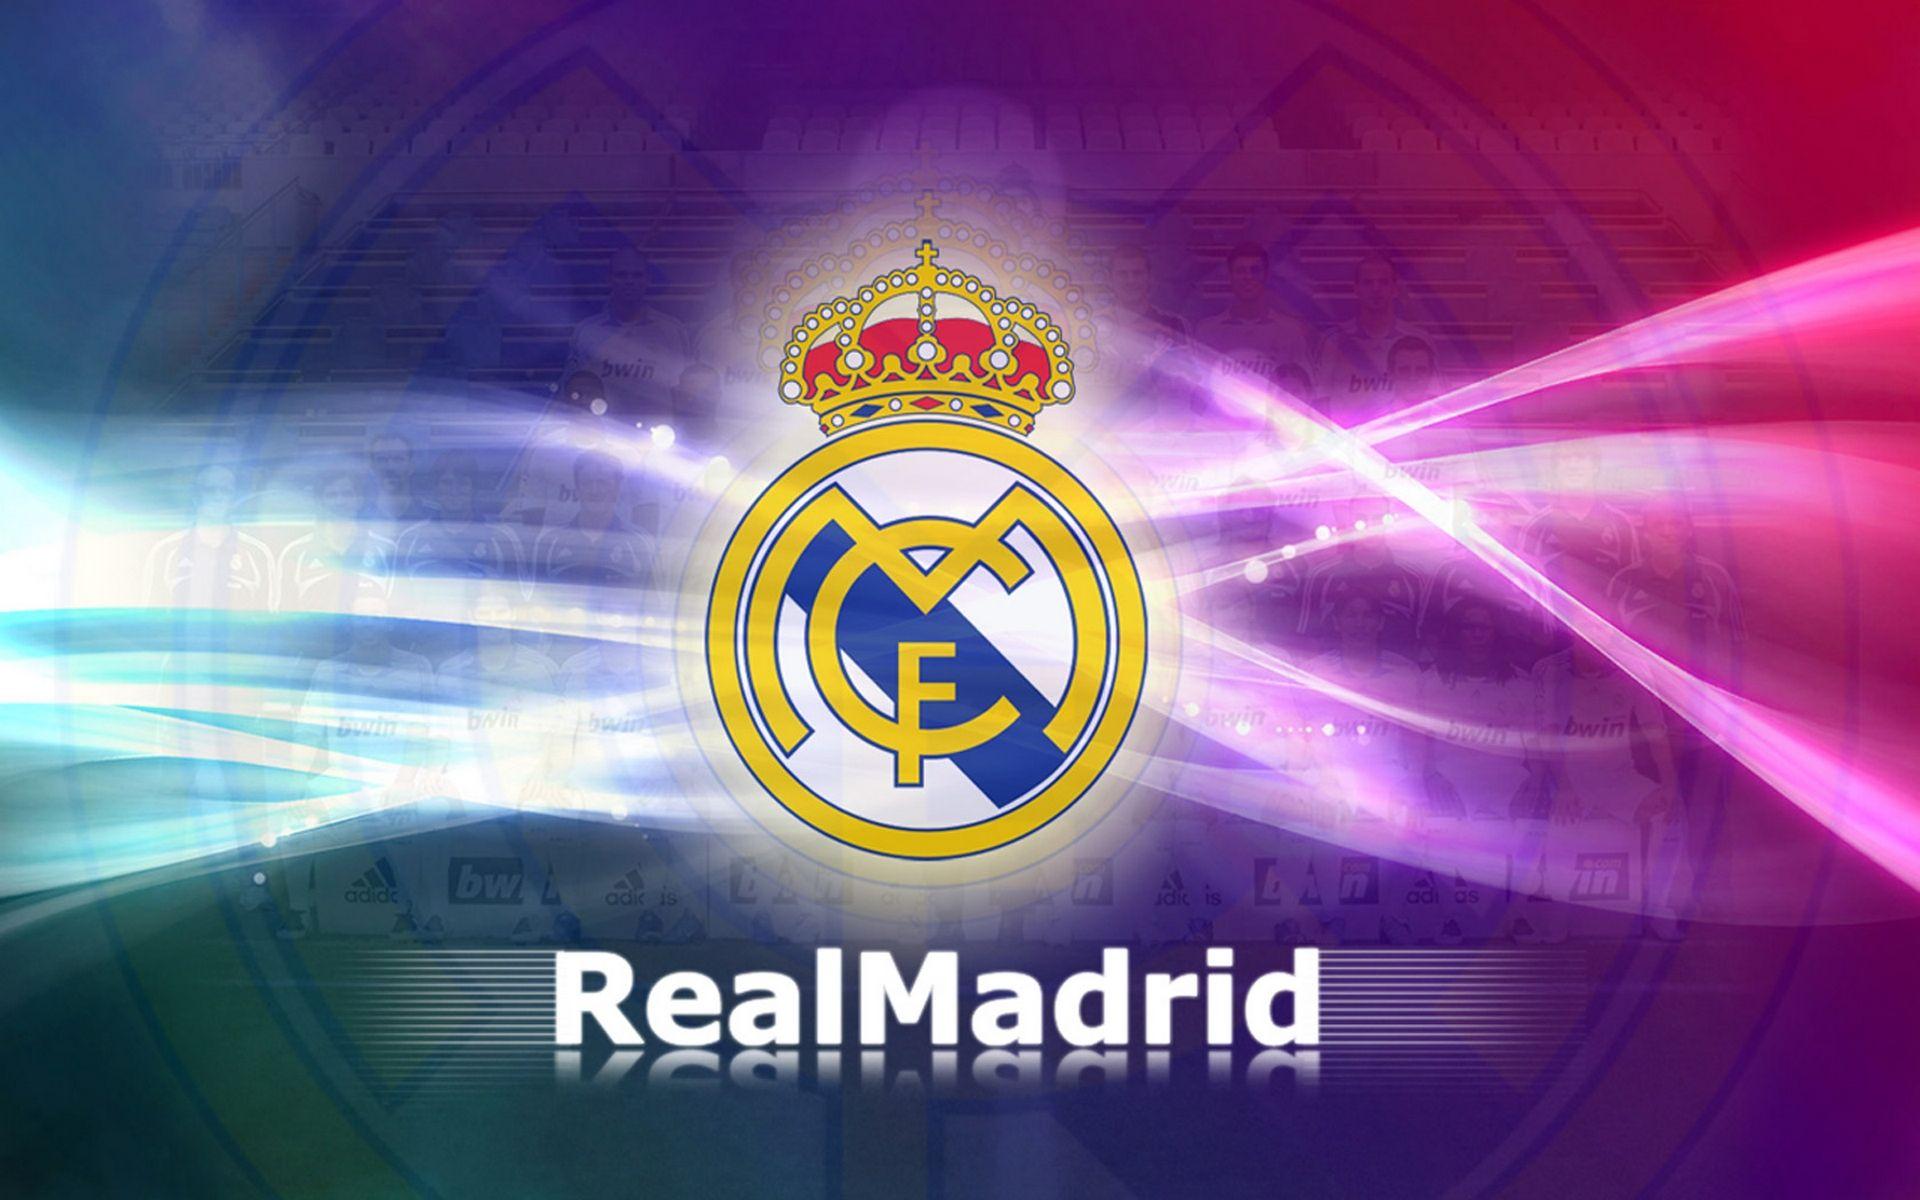 Real Madrid Uefa Champions League Best Wallpaper Hd Real Madrid Logo Wallpapers Real Madrid Logo Real Madrid Wallpapers